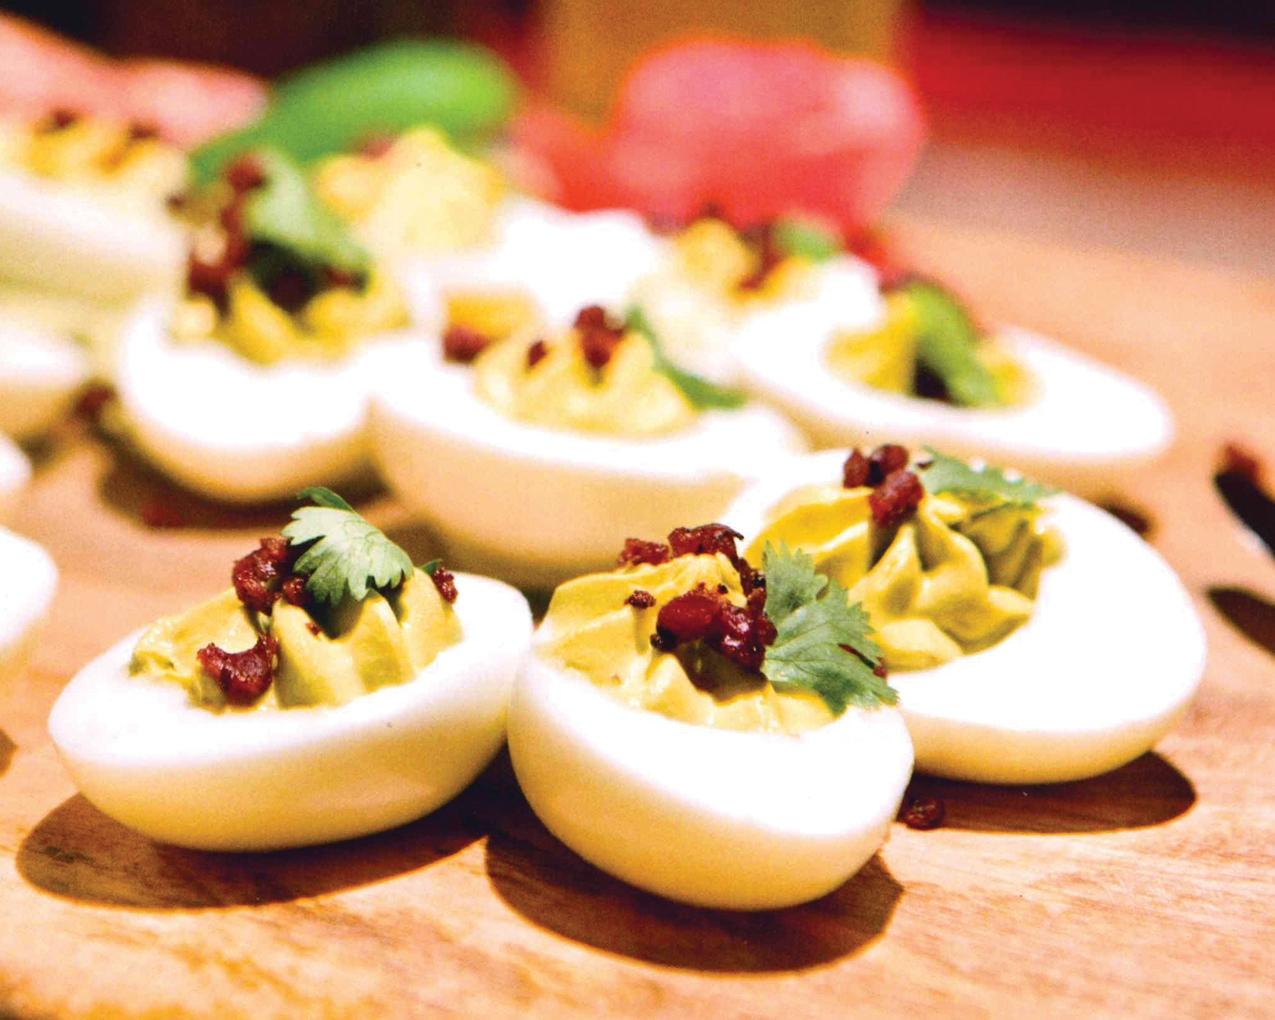 Spicy Picnic Deviled Eggs